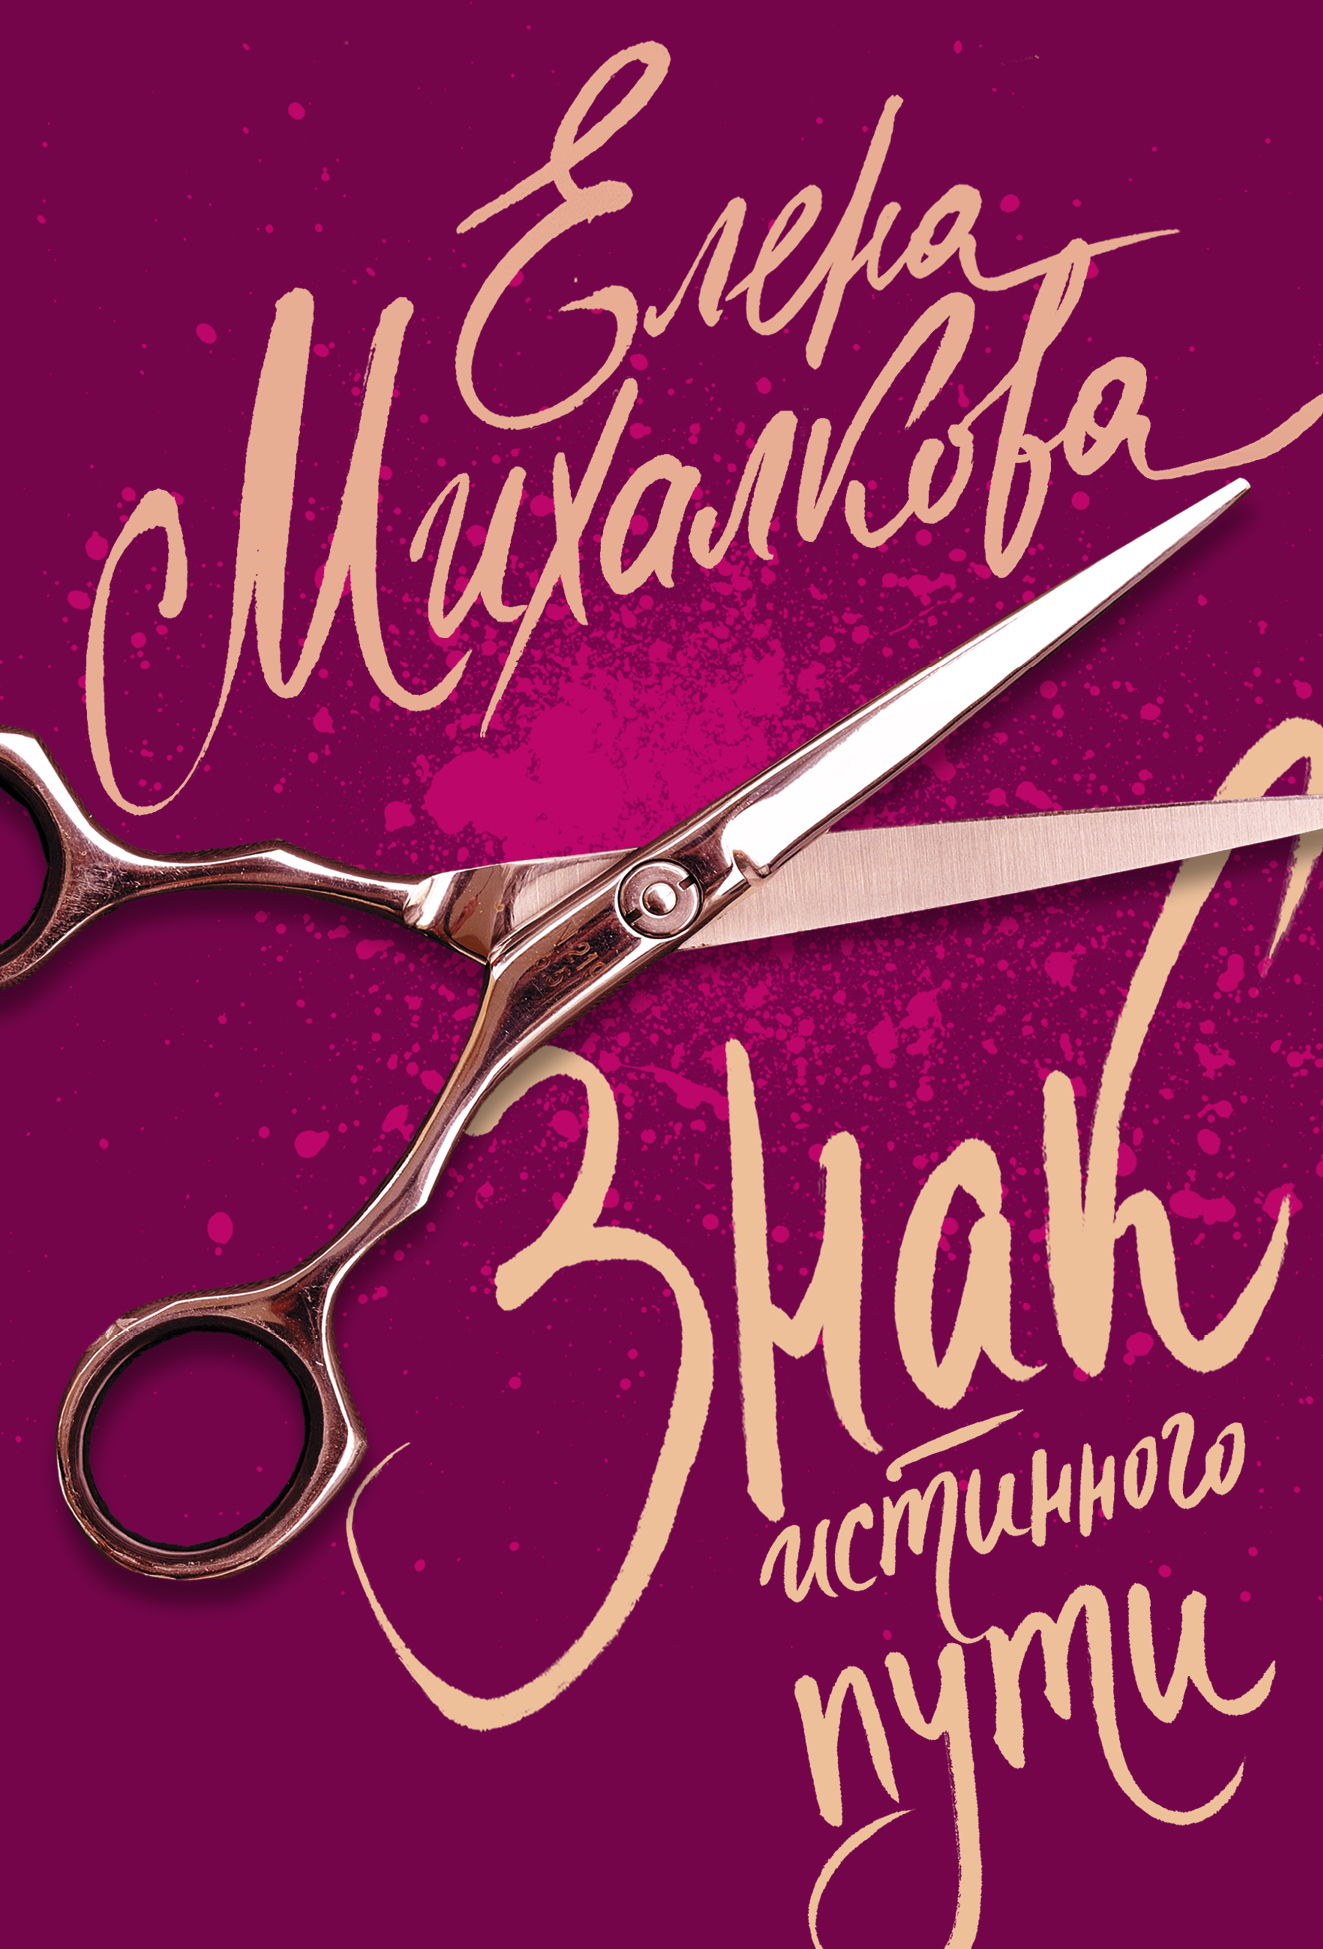 Михалкова Е.И. Знак истинного пути дмитрий янковский знак пути